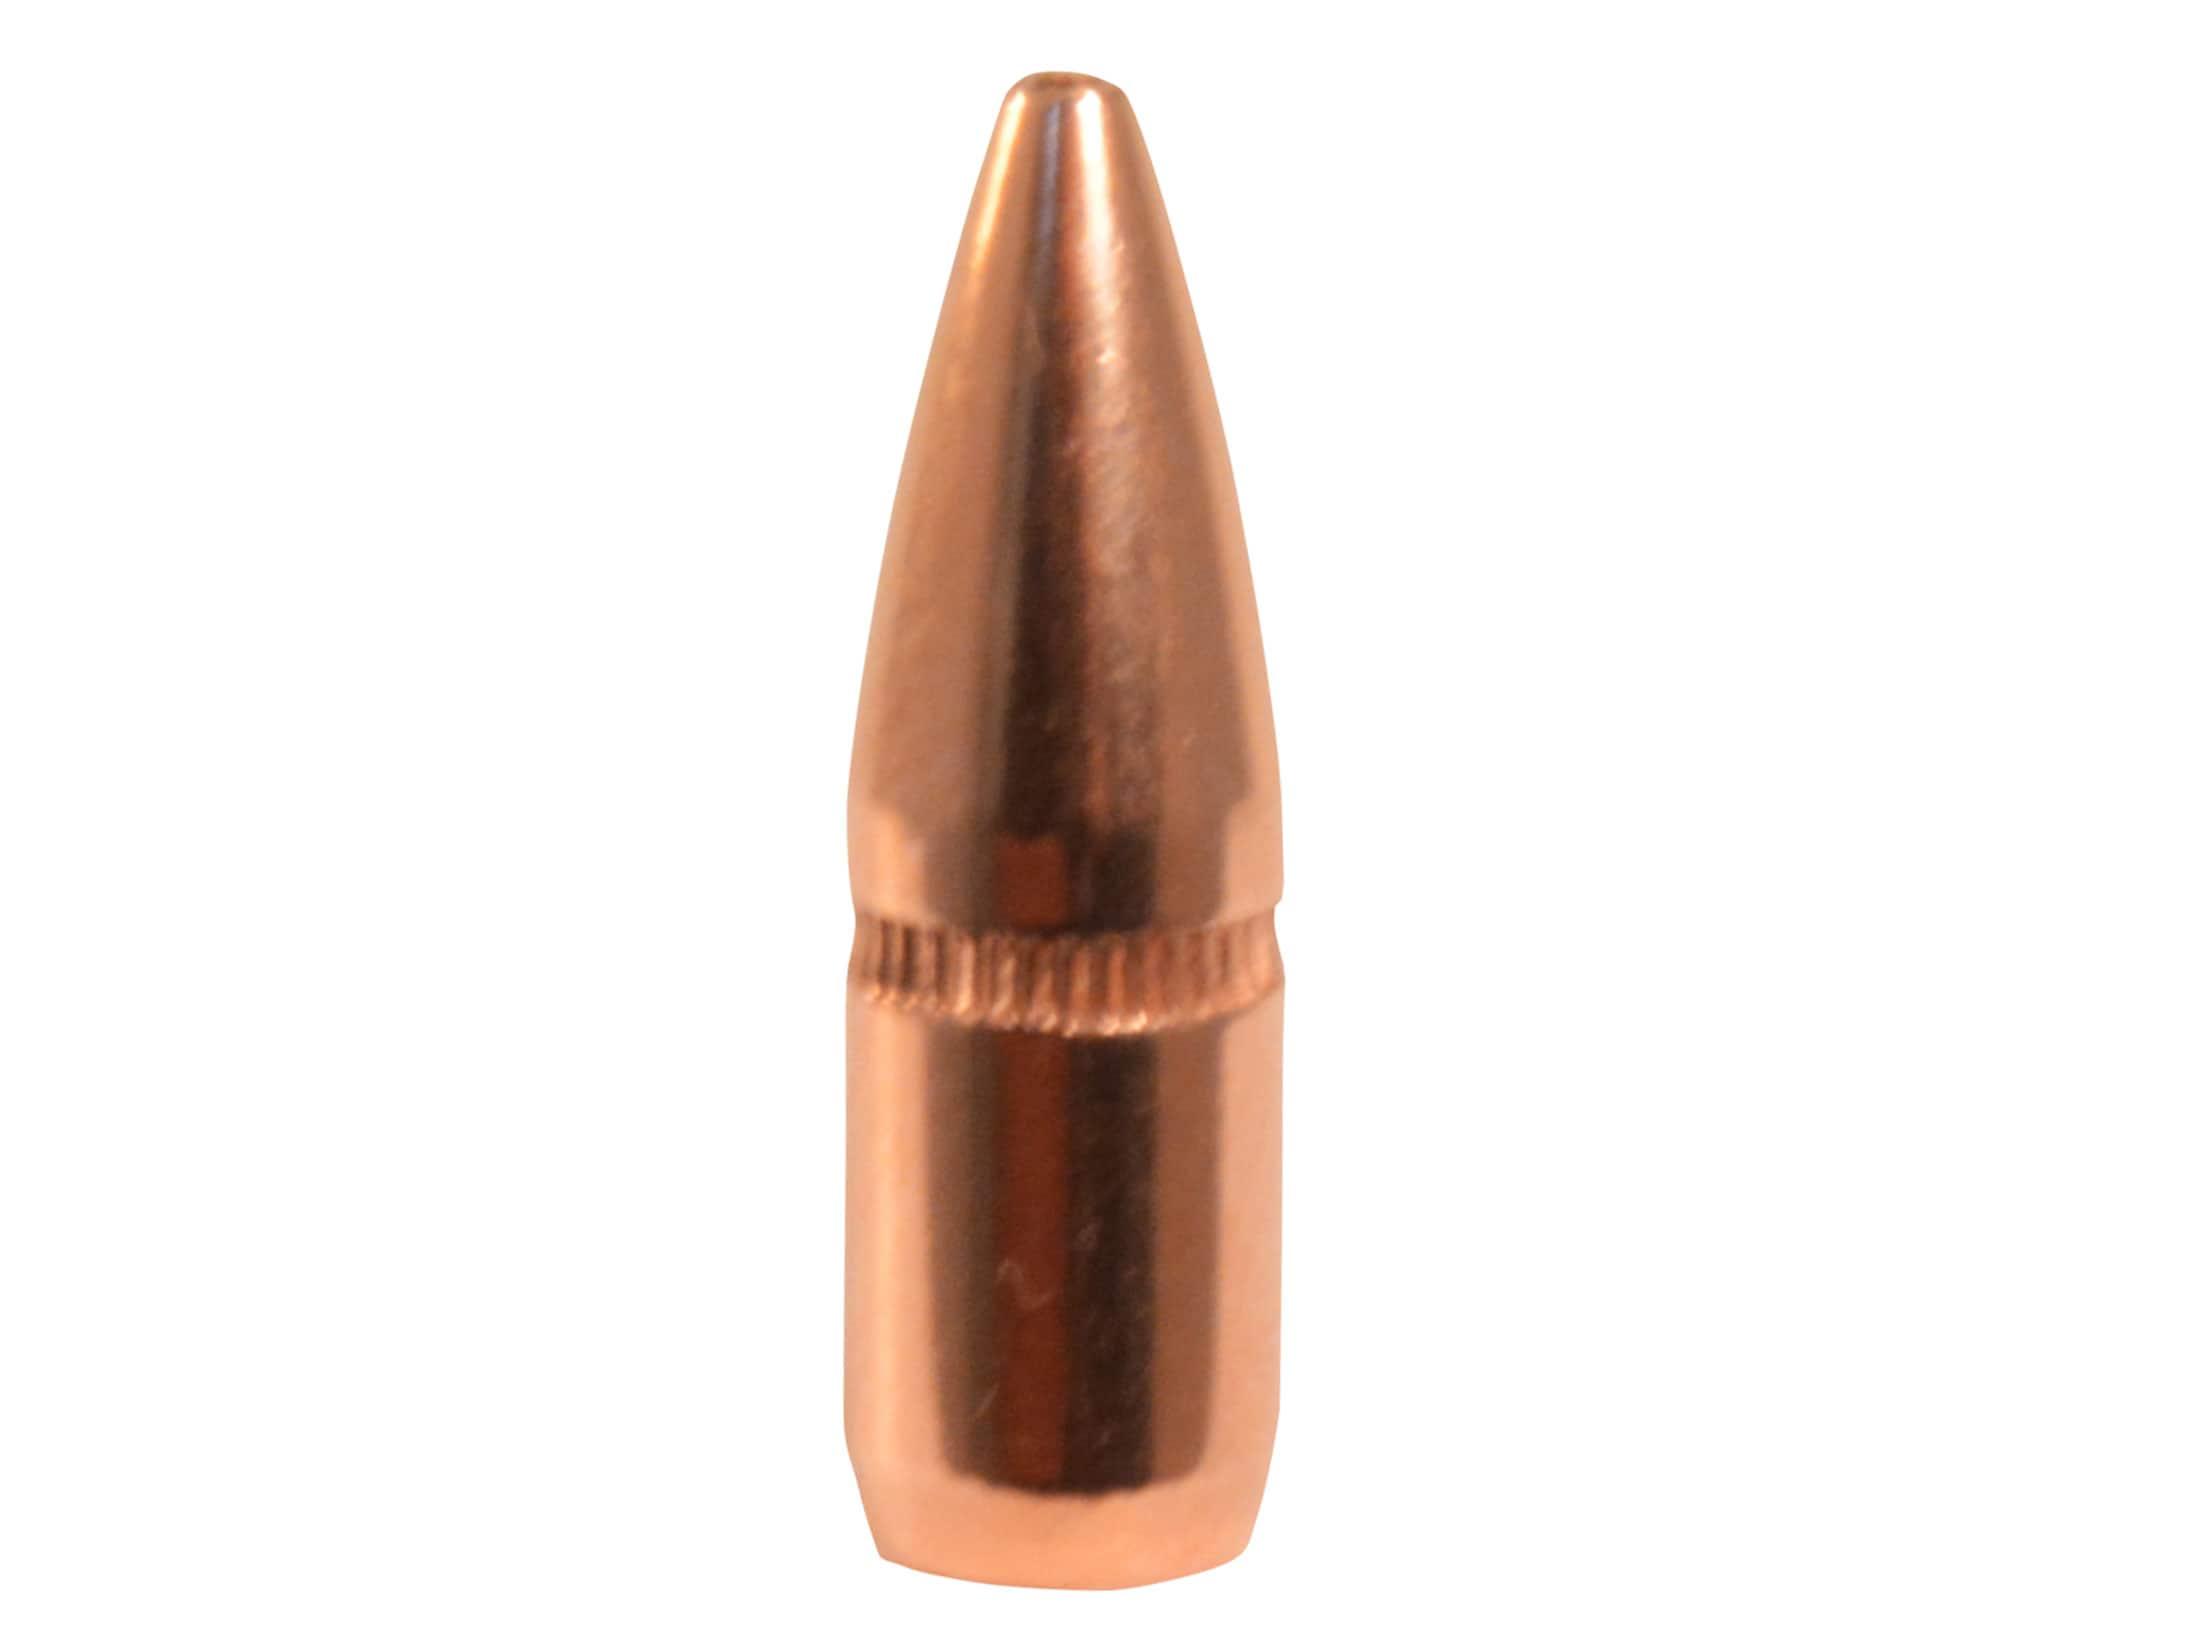 Hornady Bullets 22 Cal (224 Diameter) 55 Grain Hollow Point Boat Tail